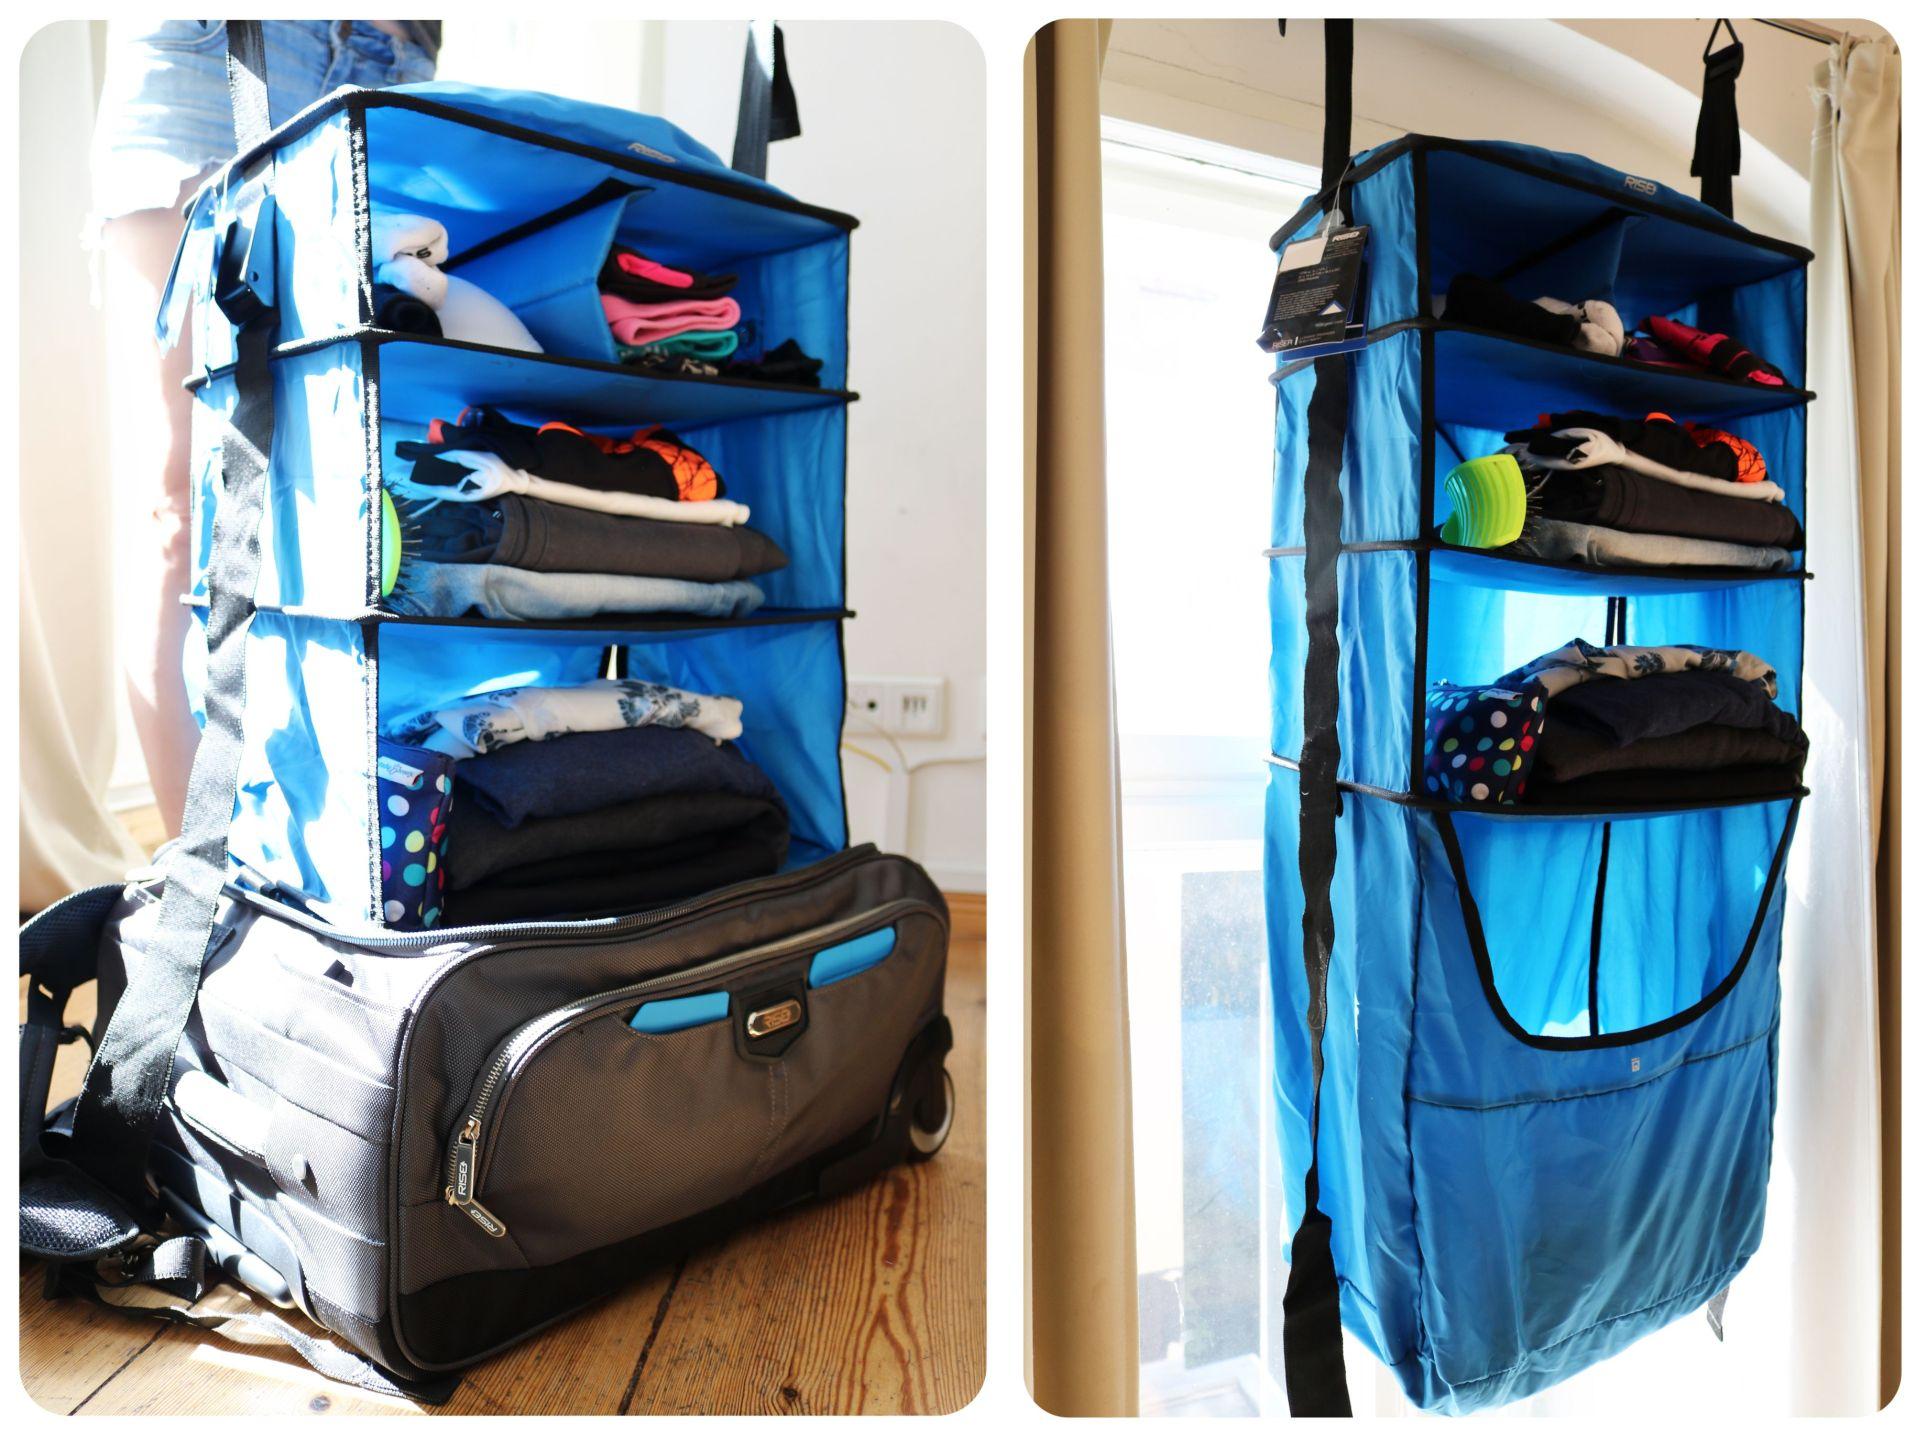 rise glider shelf system